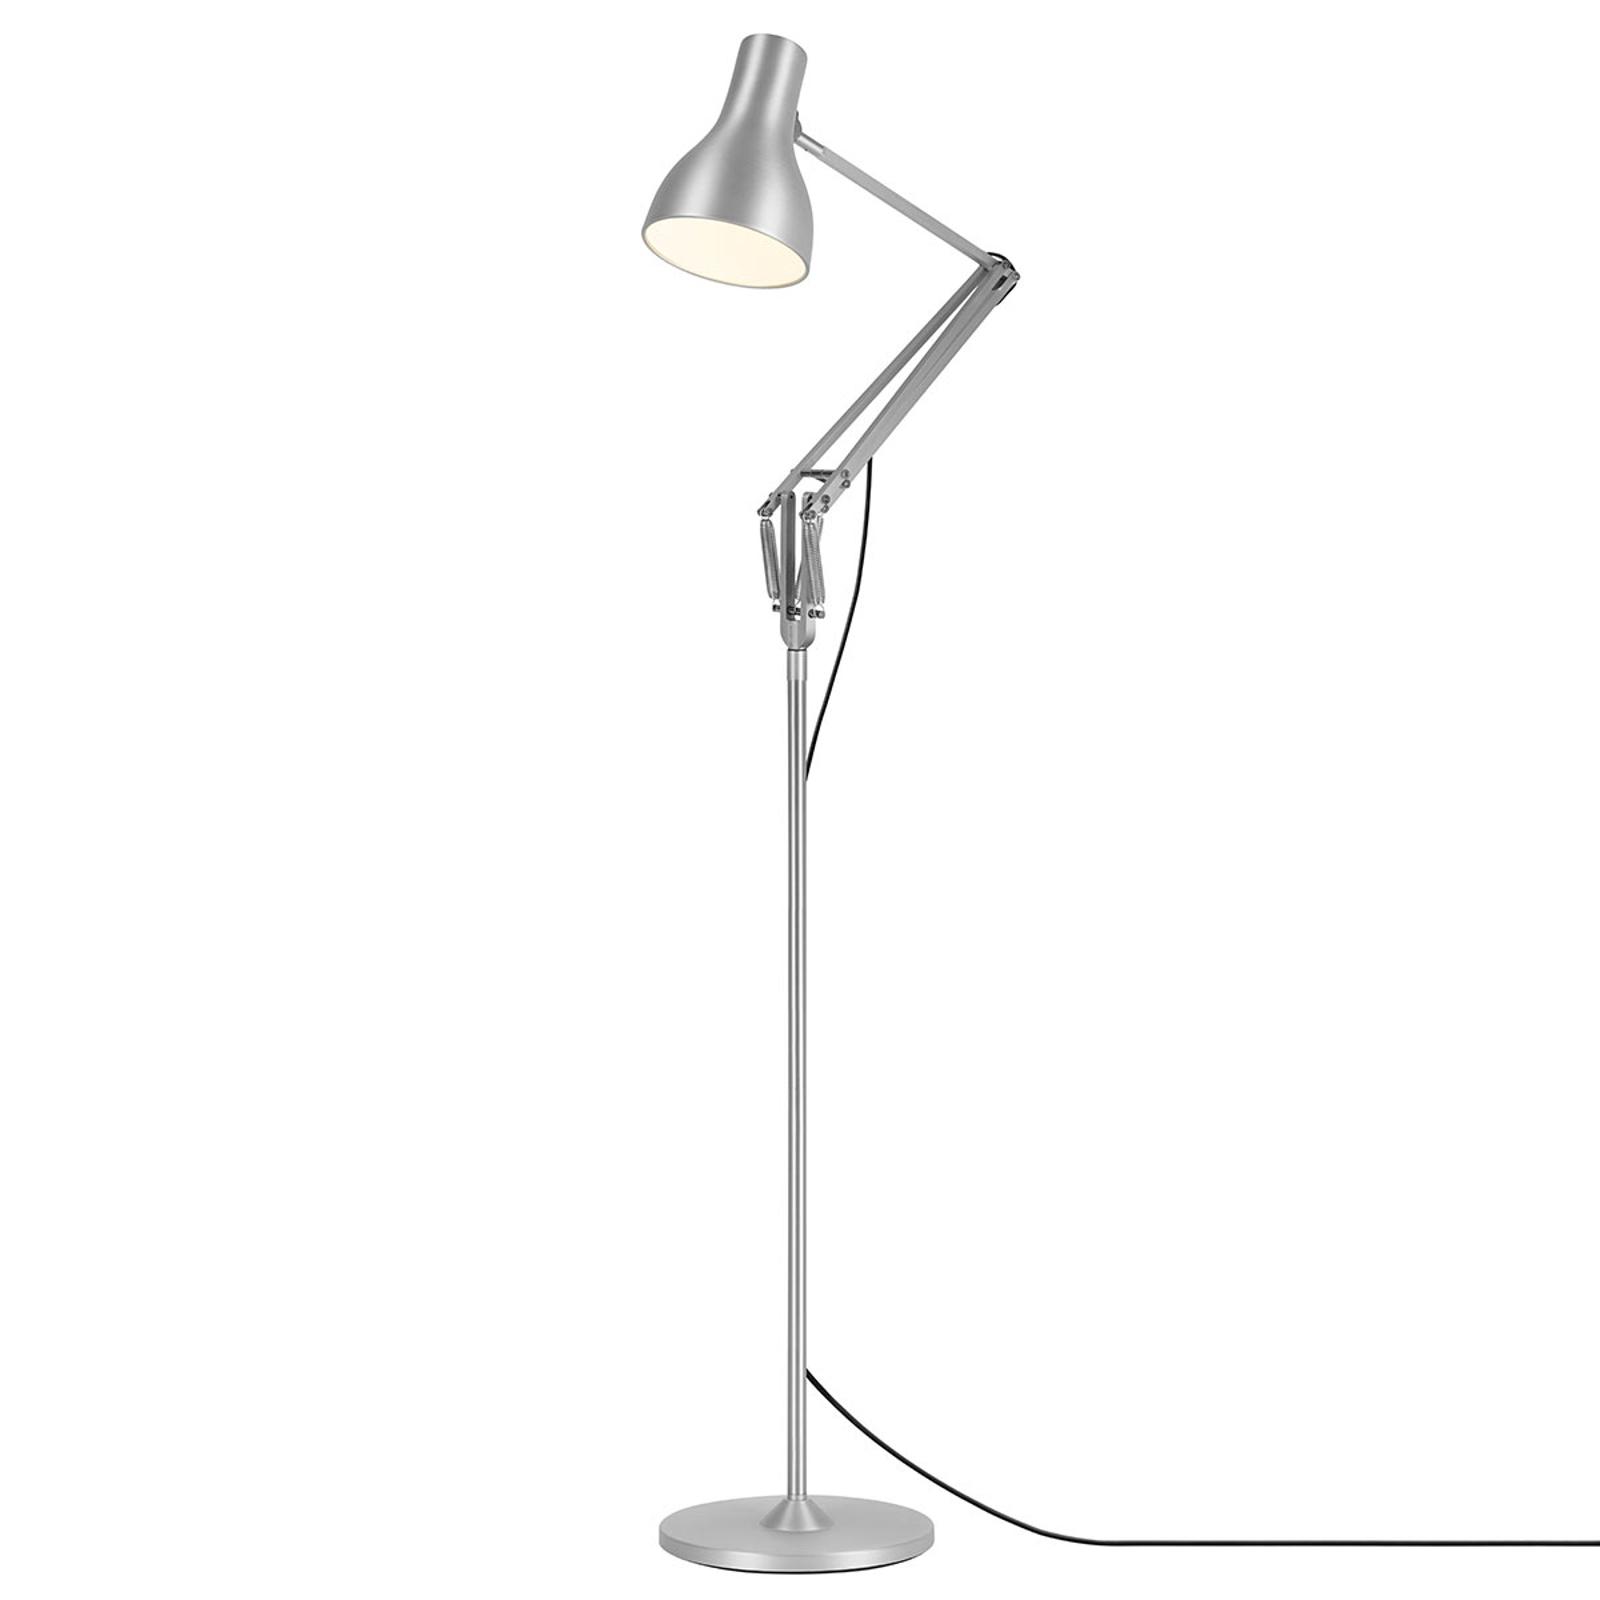 Anglepoise Type 75 lampa stojąca srebrna